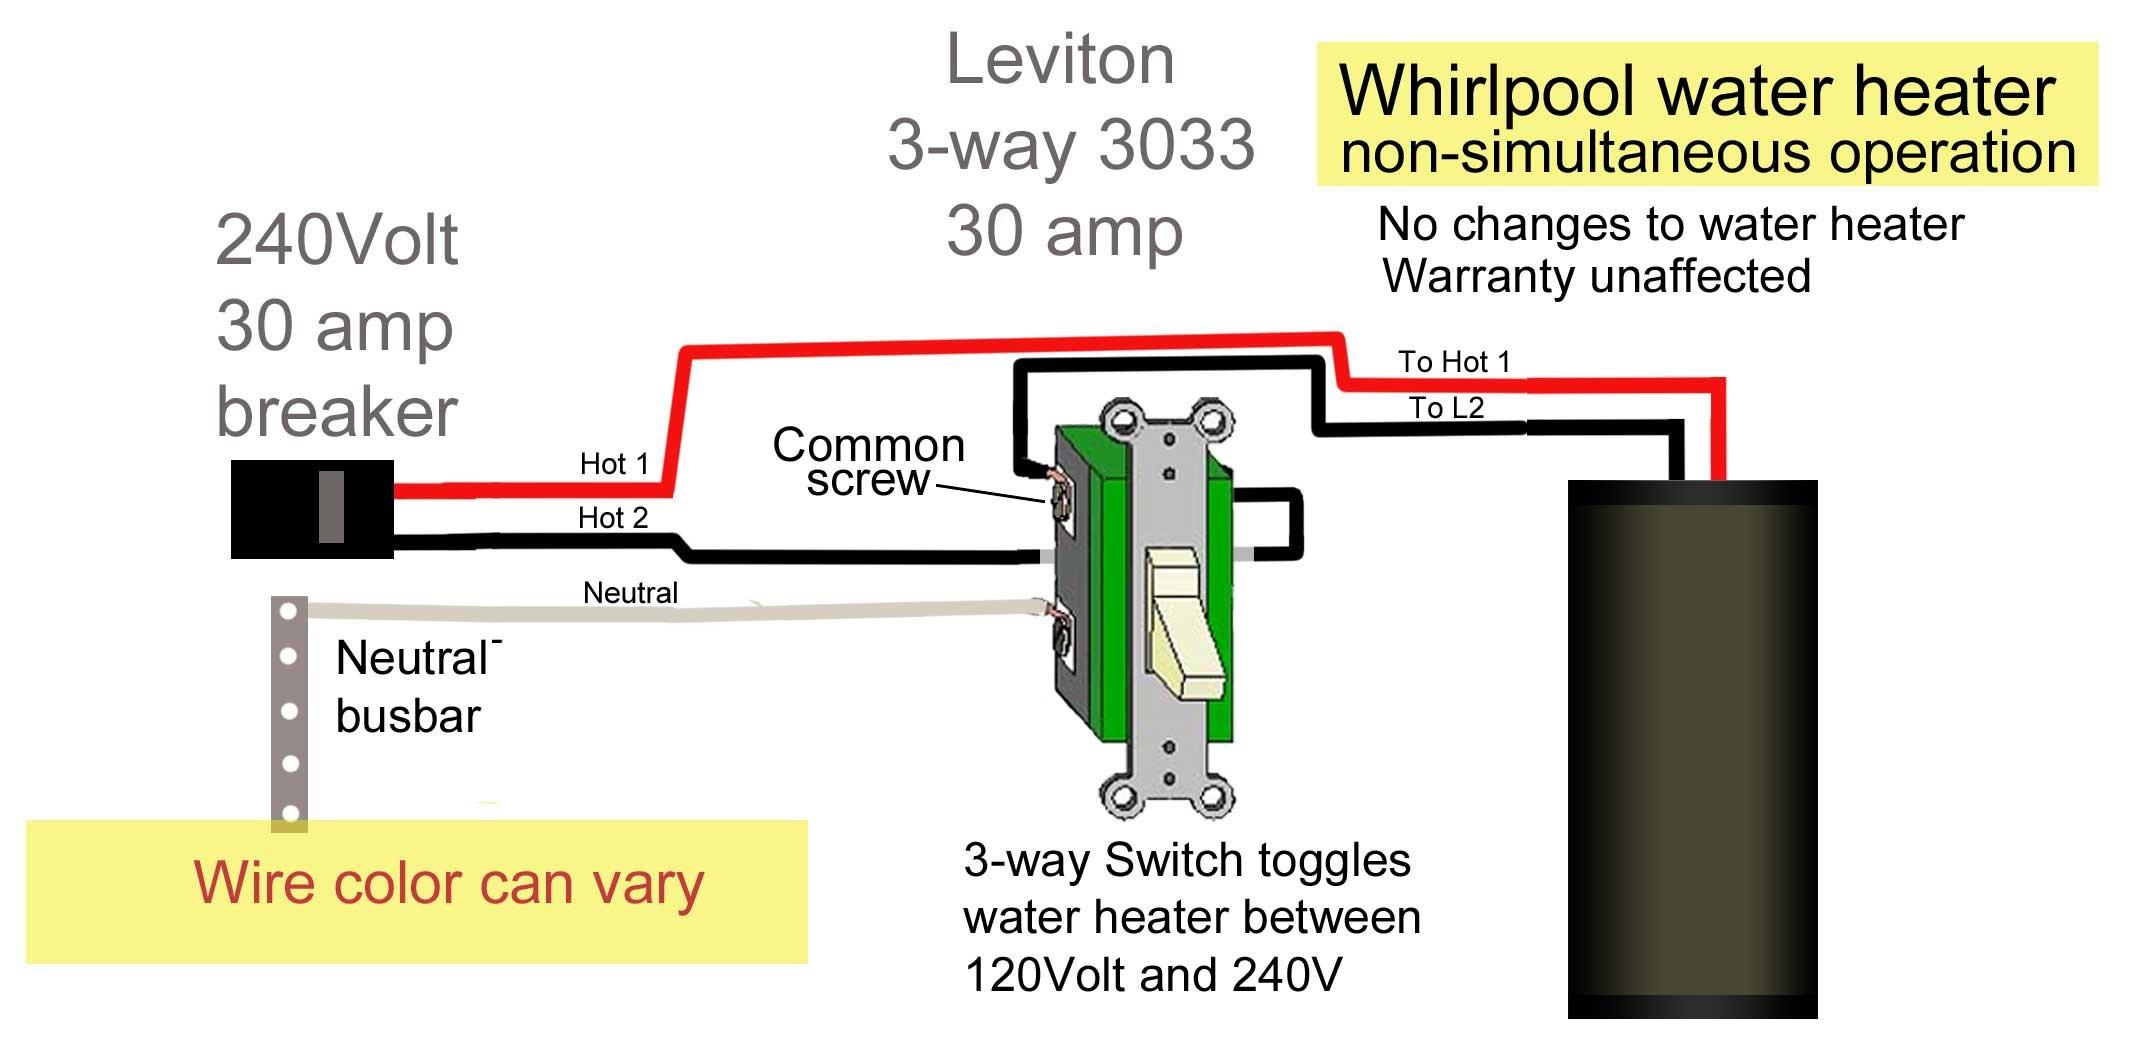 Leviton 3 Way Switch Wiring Diagram Diagram Leviton 3 Way Switch Wiring Exceptional Light Diagrams Afif Of Leviton 3 Way Switch Wiring Diagram Luxury 3 Way Wiring Diagram Diagram